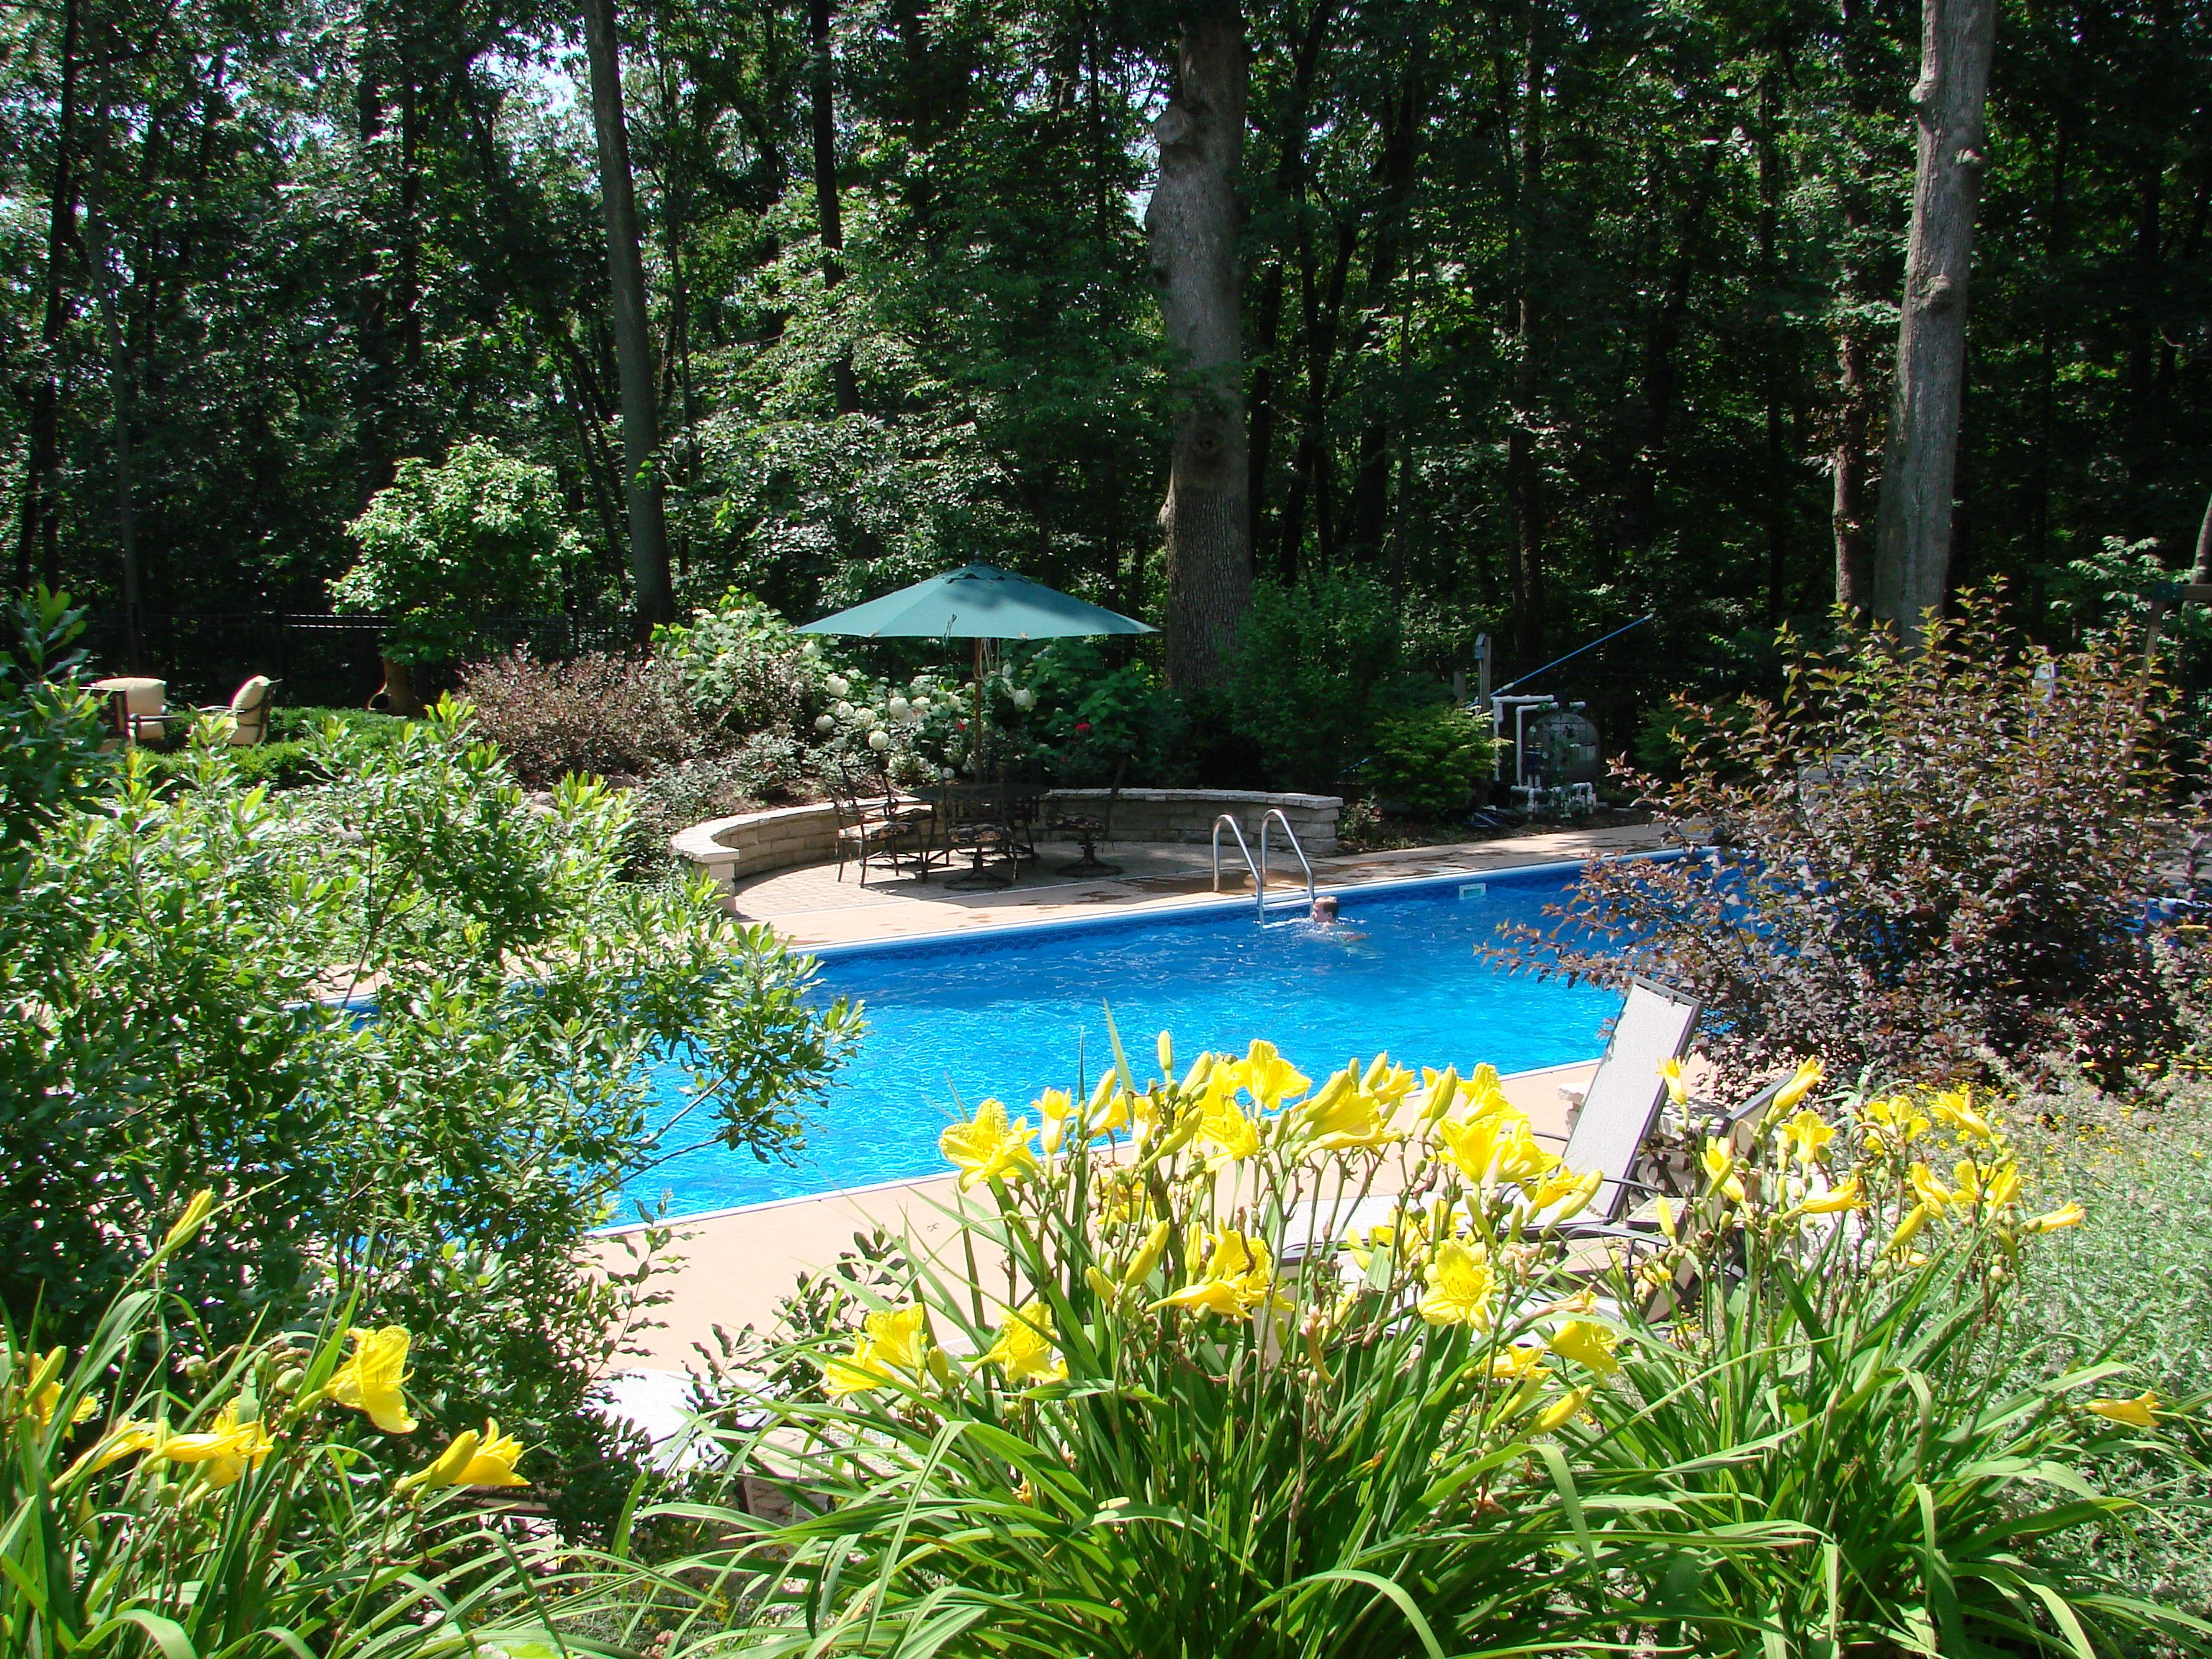 Landscaping around pool garden pinterest landscaping for Gardens around pools